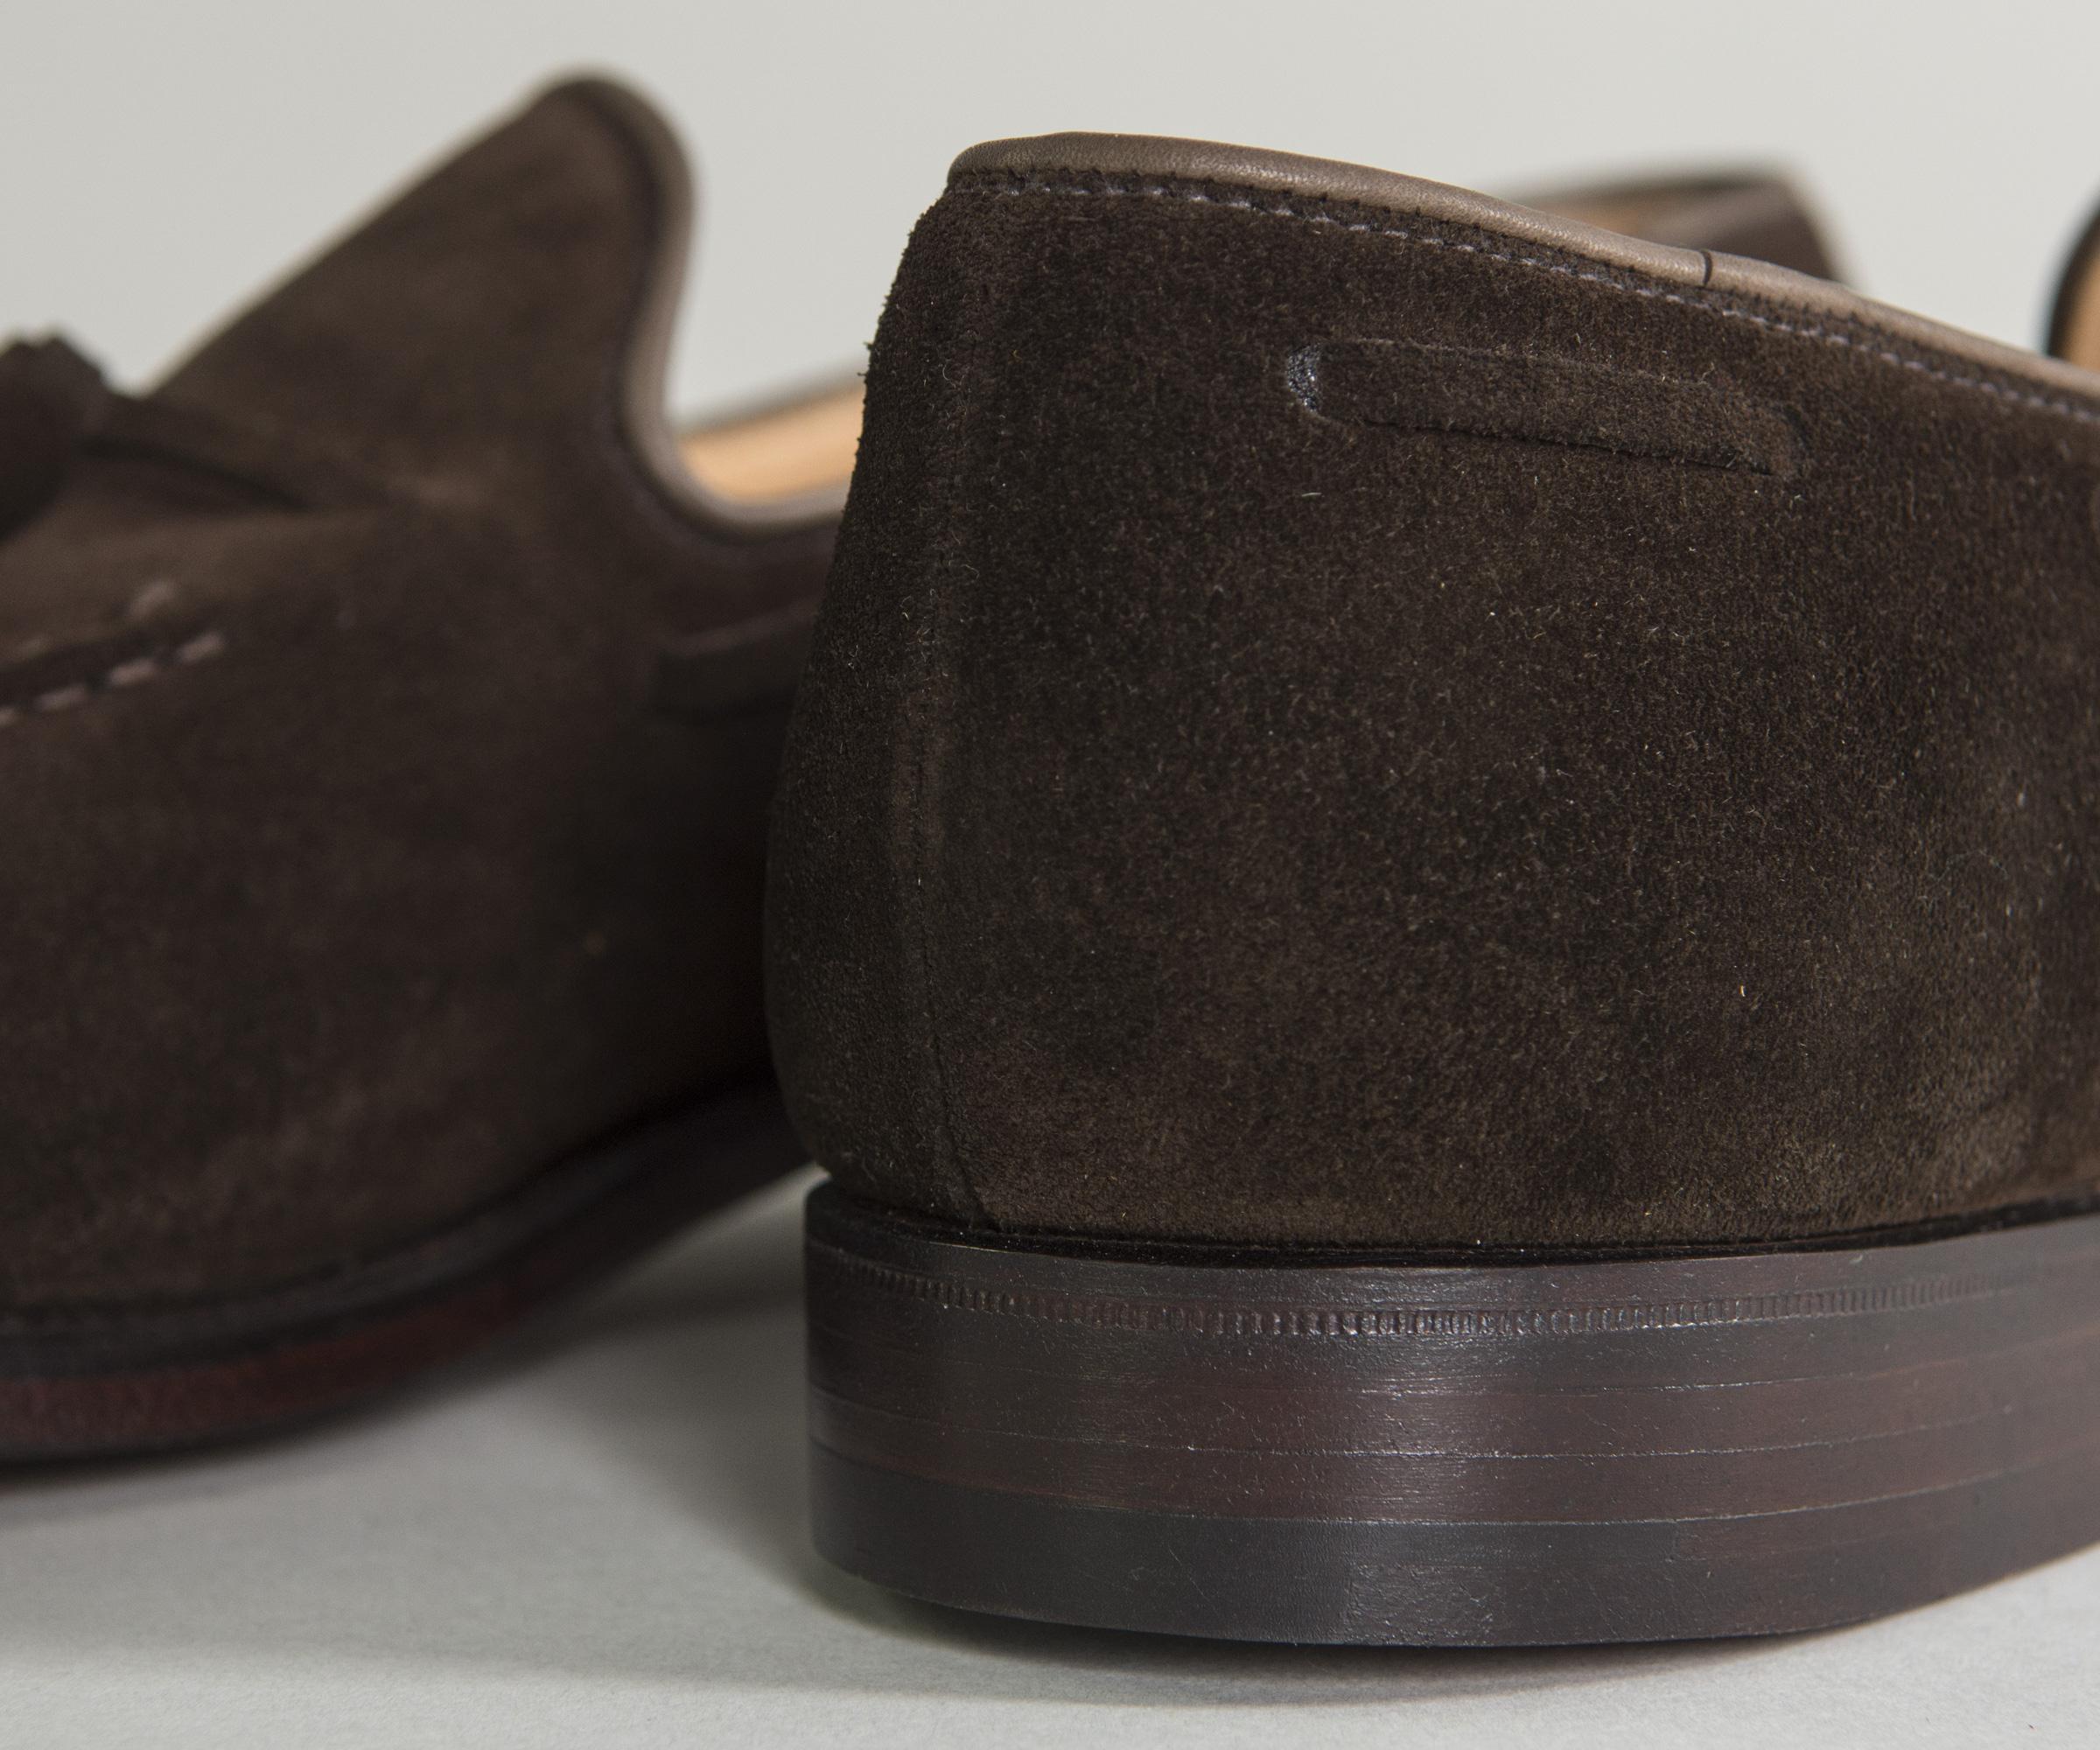 633e1eb5f67 Crockett and Jones -  cavendish  Calf Suede Loafers Dark Brown for Men -  Lyst. View fullscreen